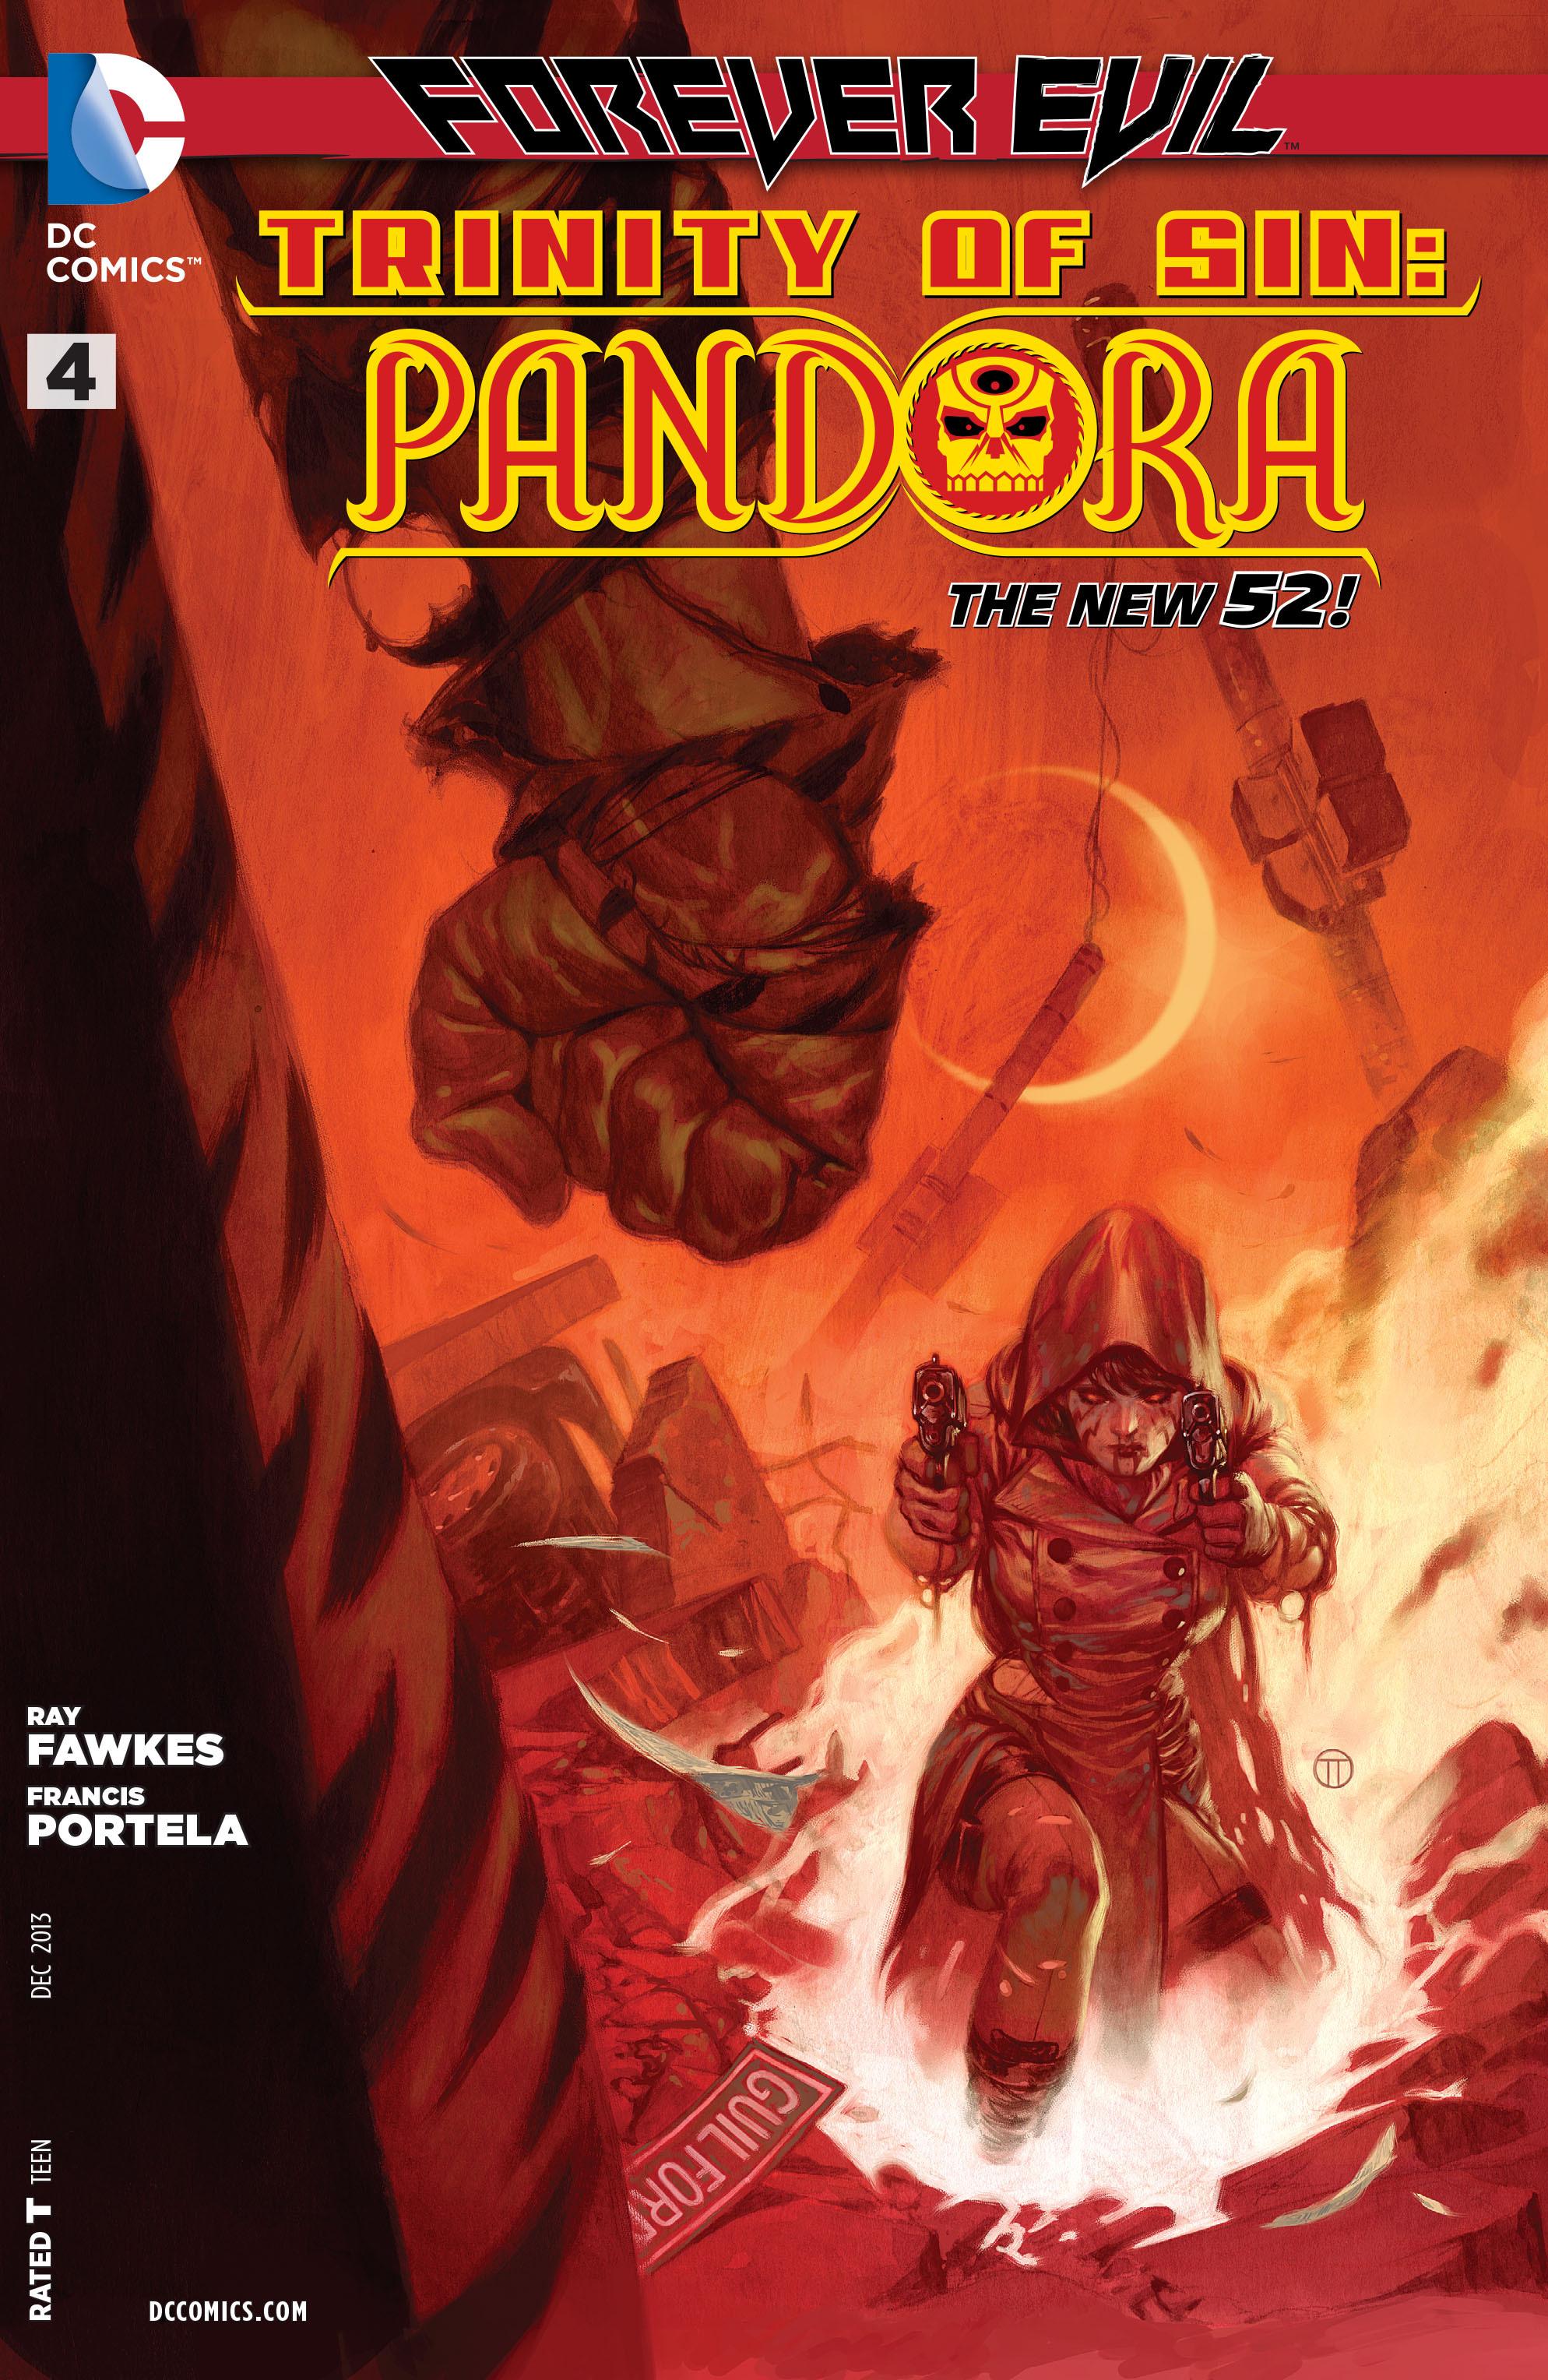 Read online Trinity of Sin: Pandora comic -  Issue #4 - 1